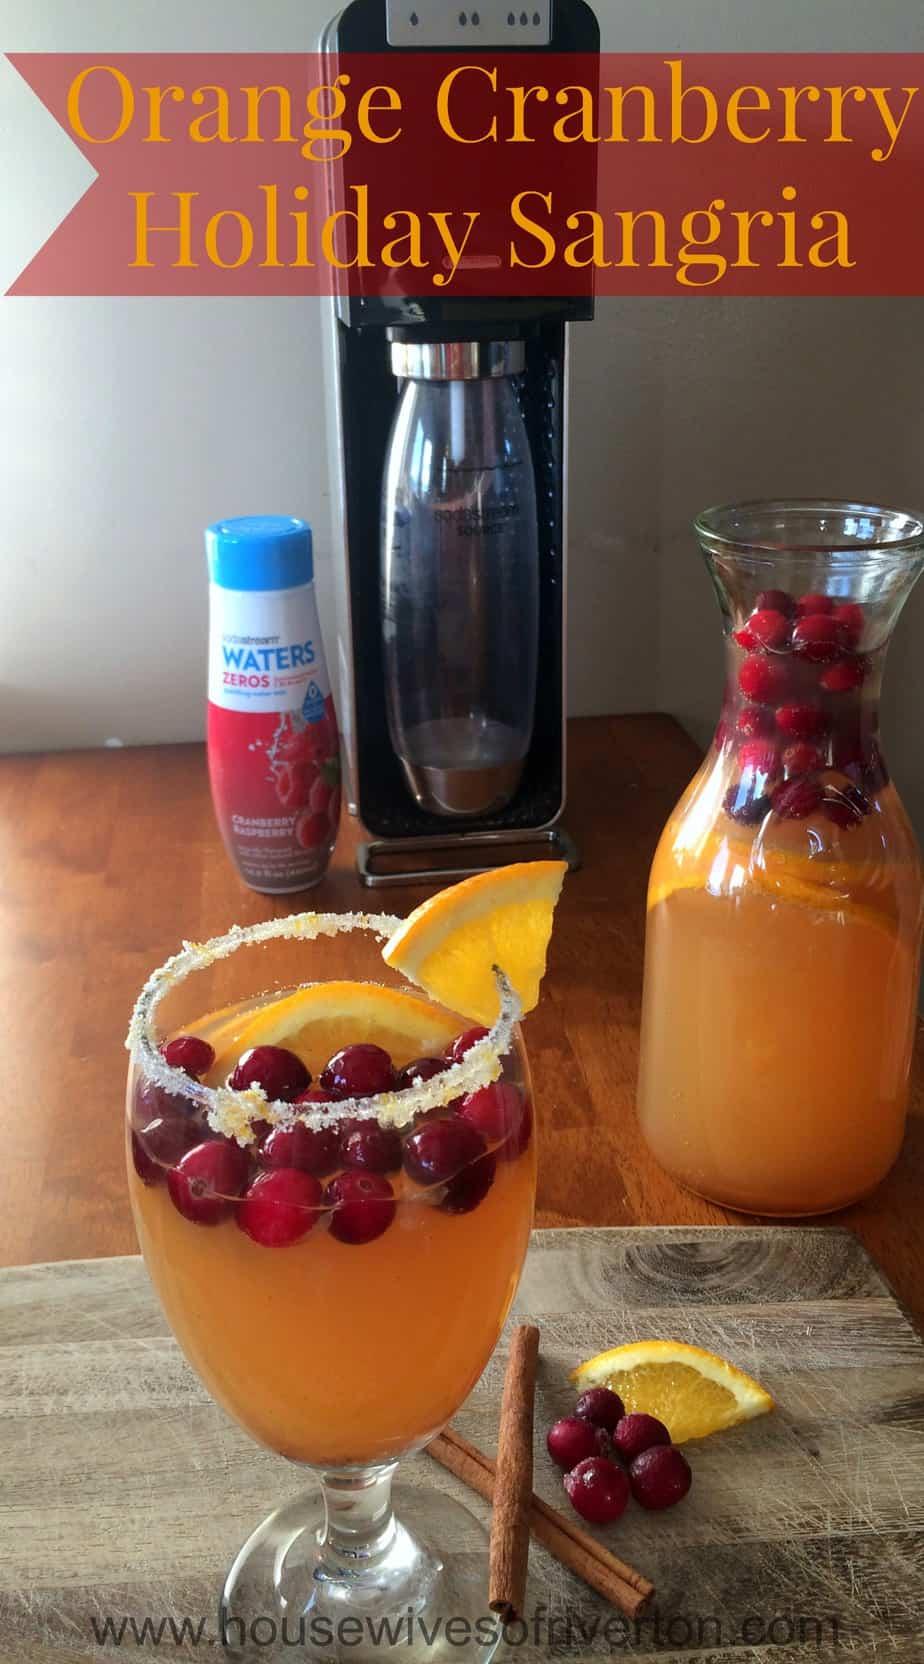 Non Alcoholic Orange Cranberry Holiday Sangria